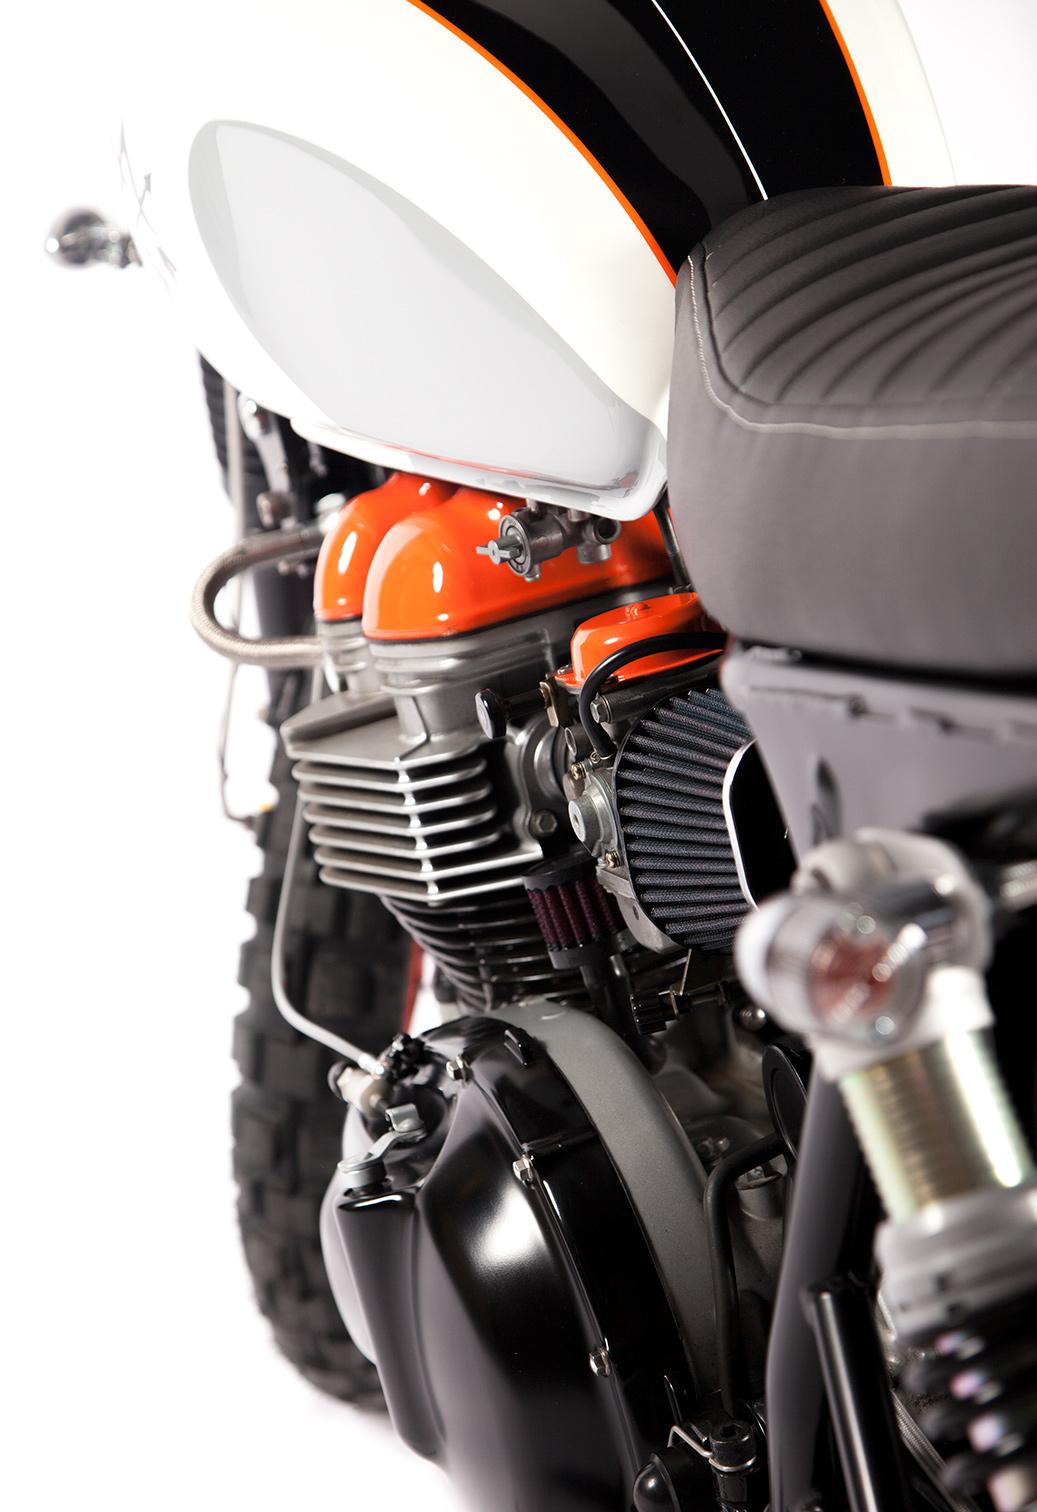 maria_motorcycles_triumph_bonneville_julijana_7631